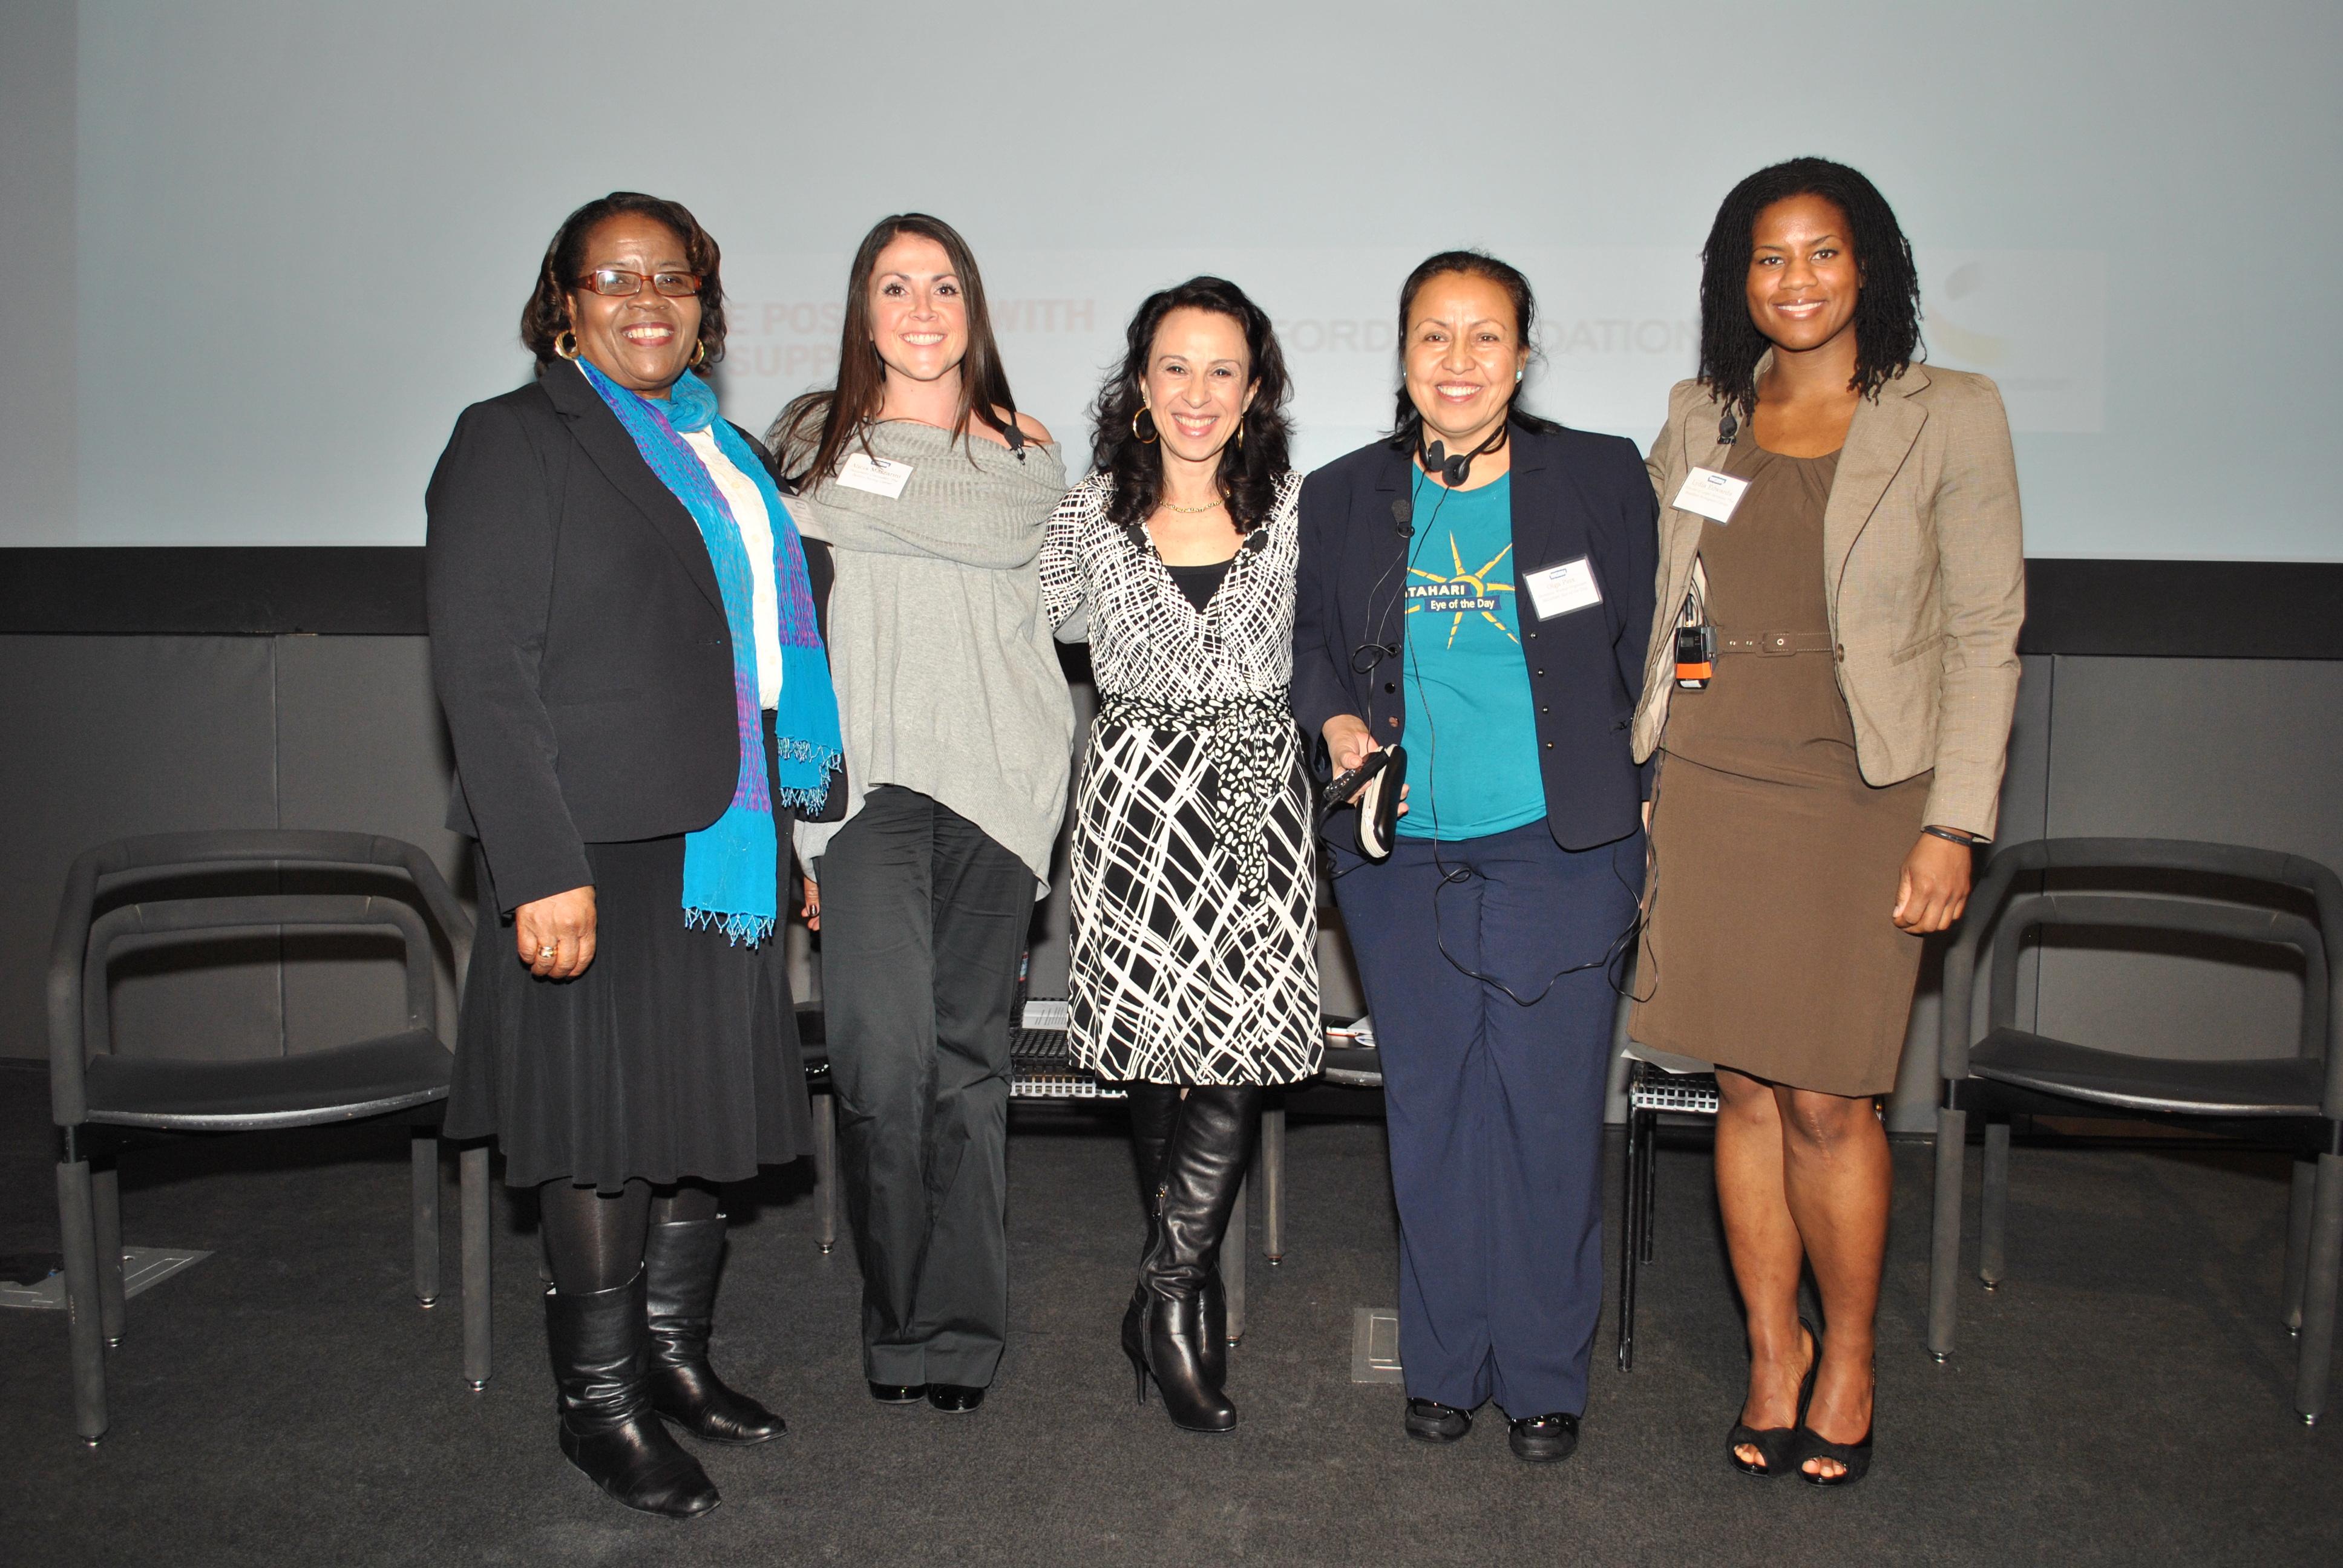 L-R: Barbara Young, Alicia Mazzarini, Maria Hinojosa, Olga Piox, Lydia Edwards